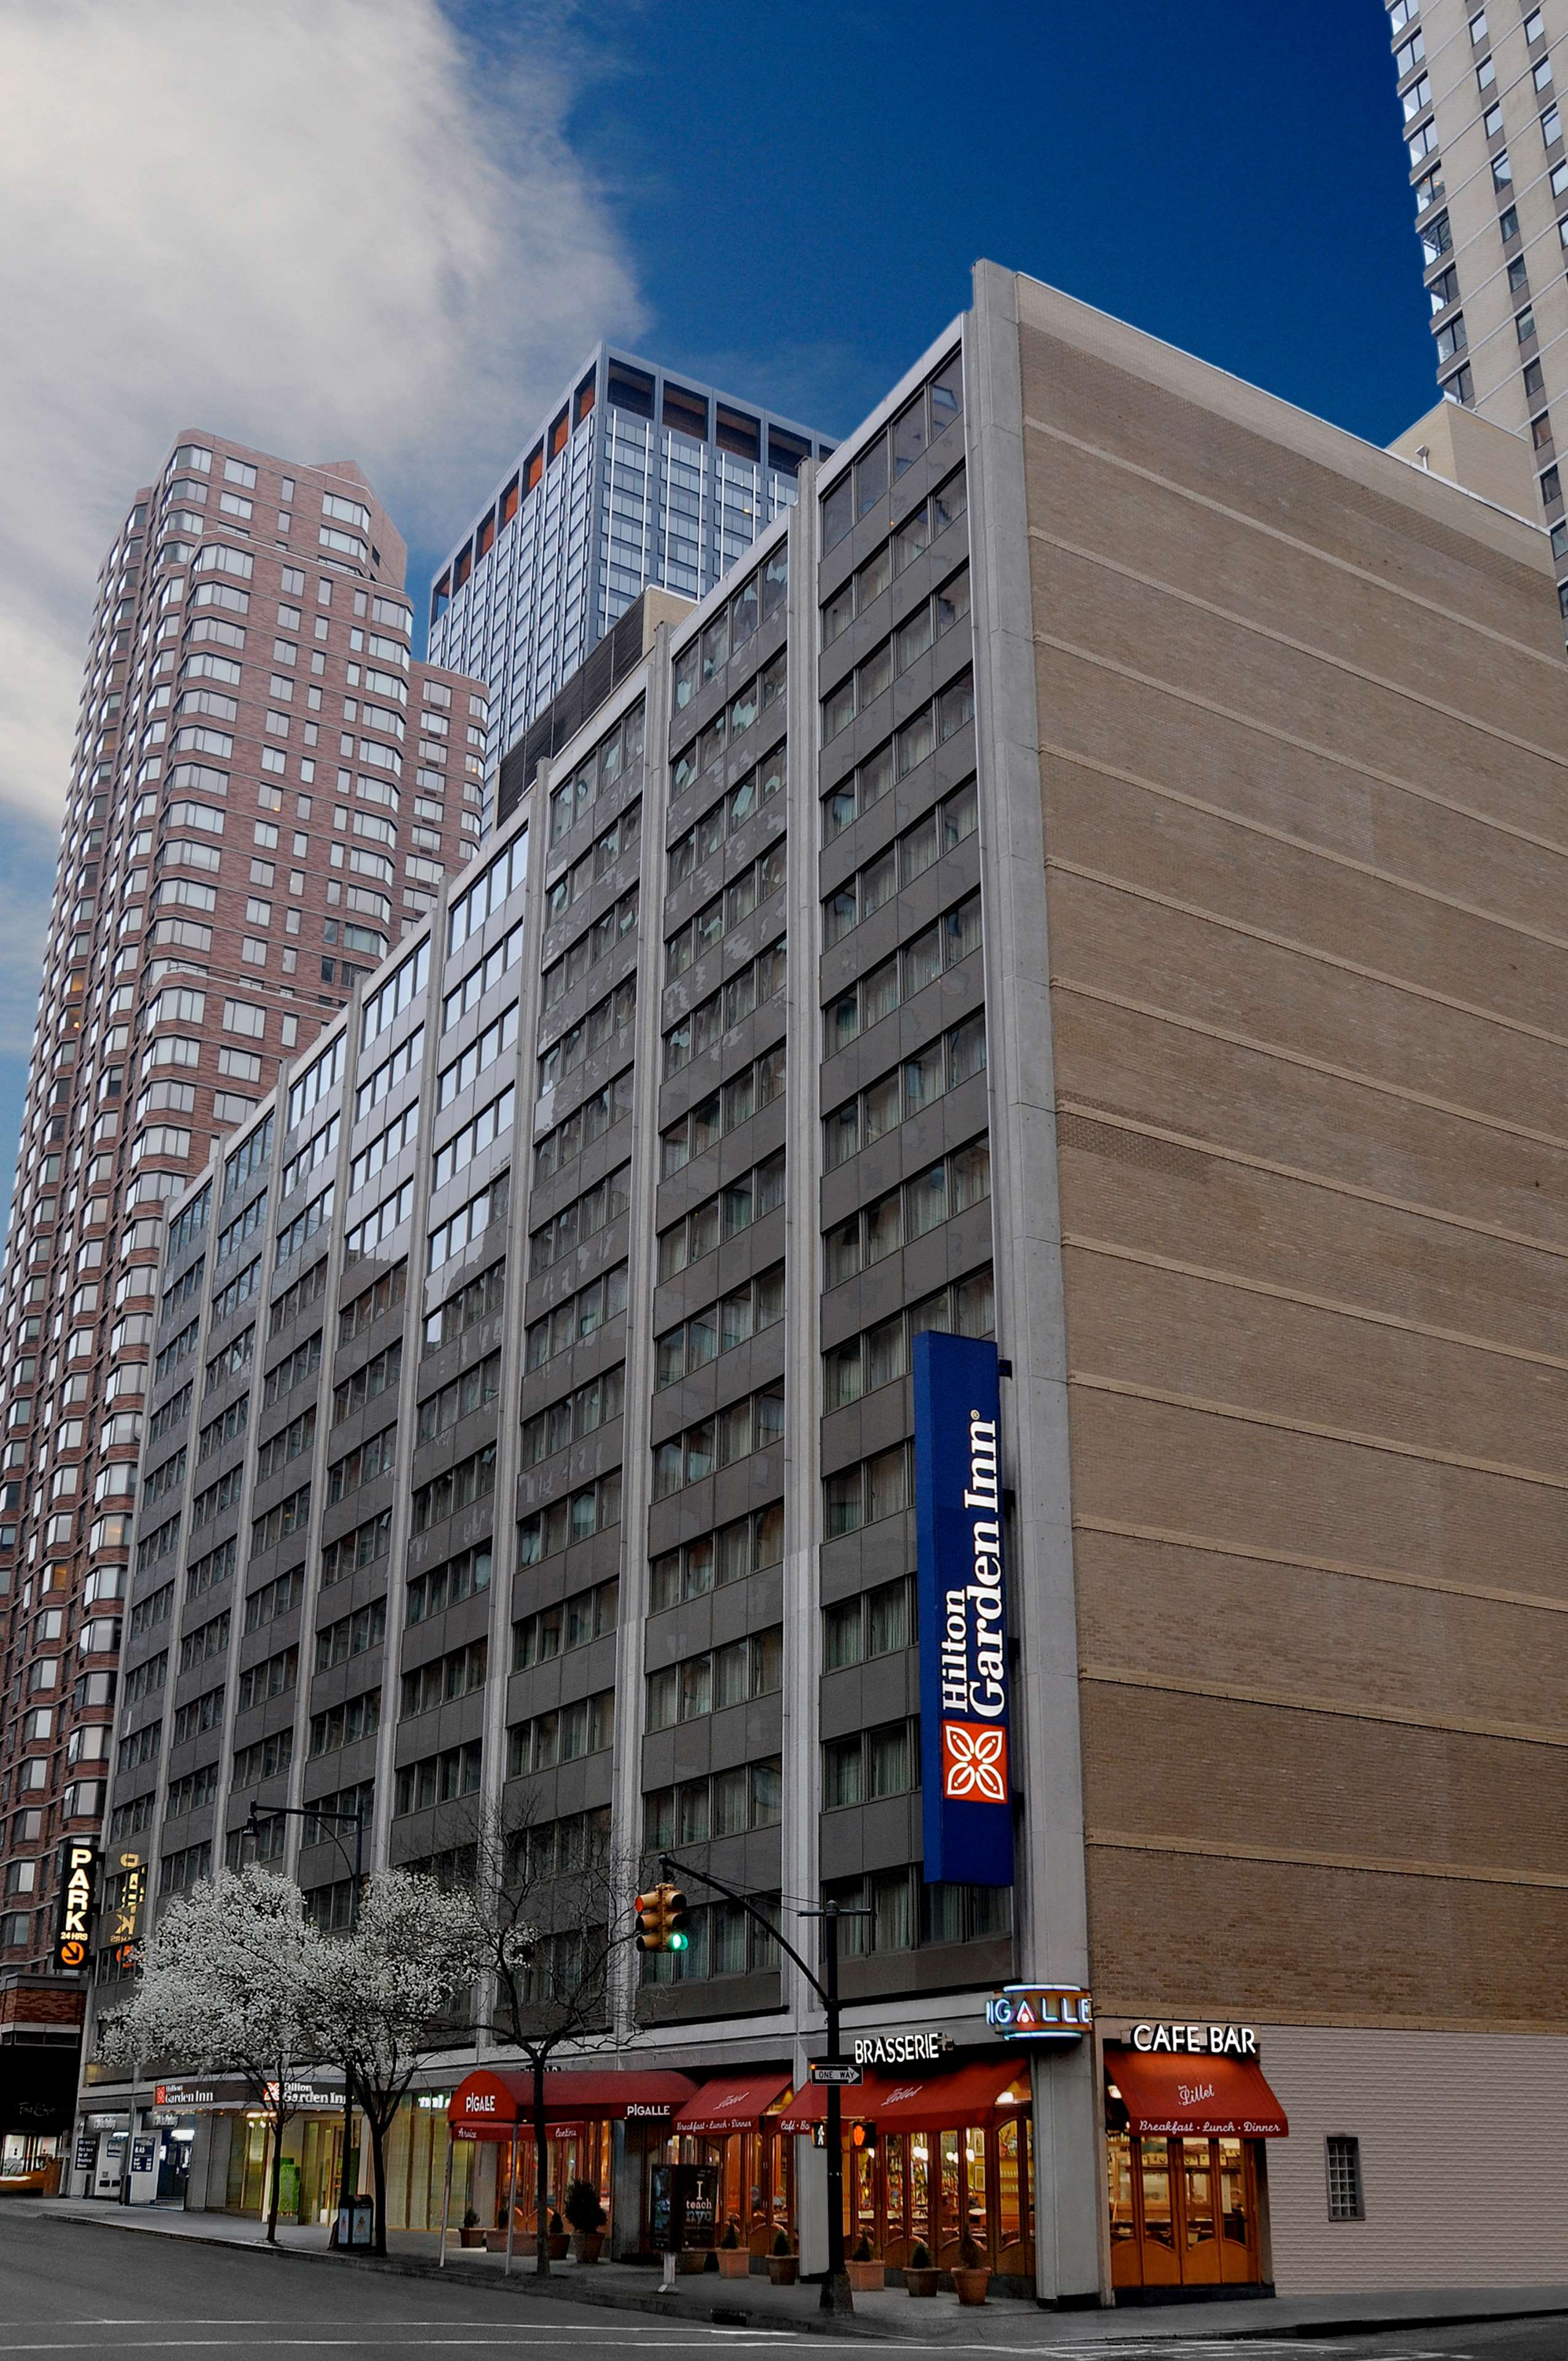 Hilton Garden Inn Times Square image 4